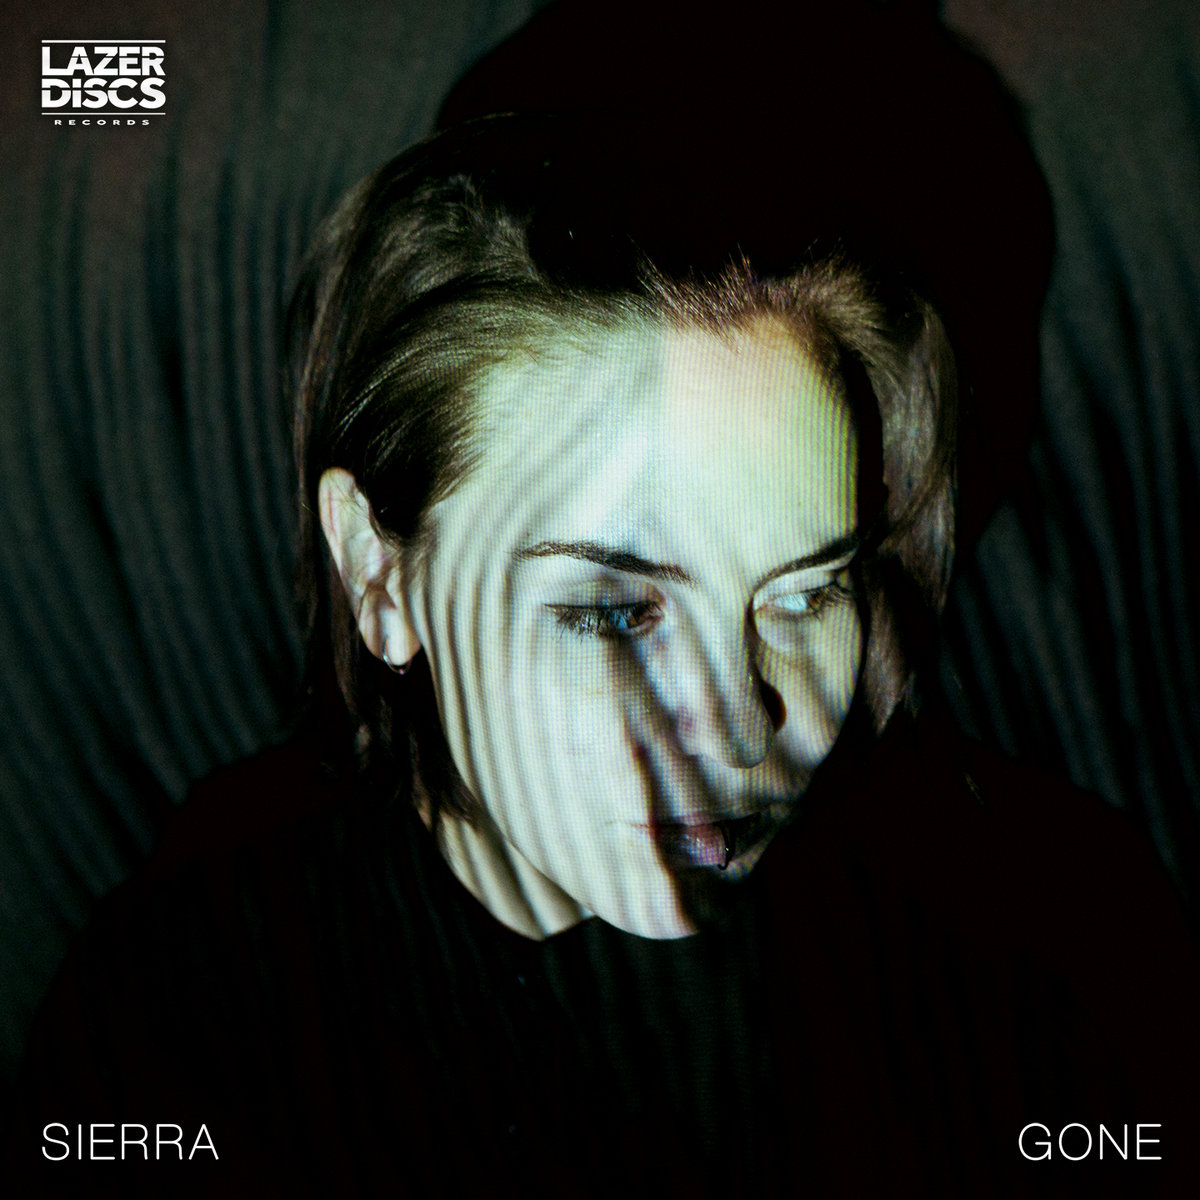 a2575789455 10 - Sierra - Gone EP